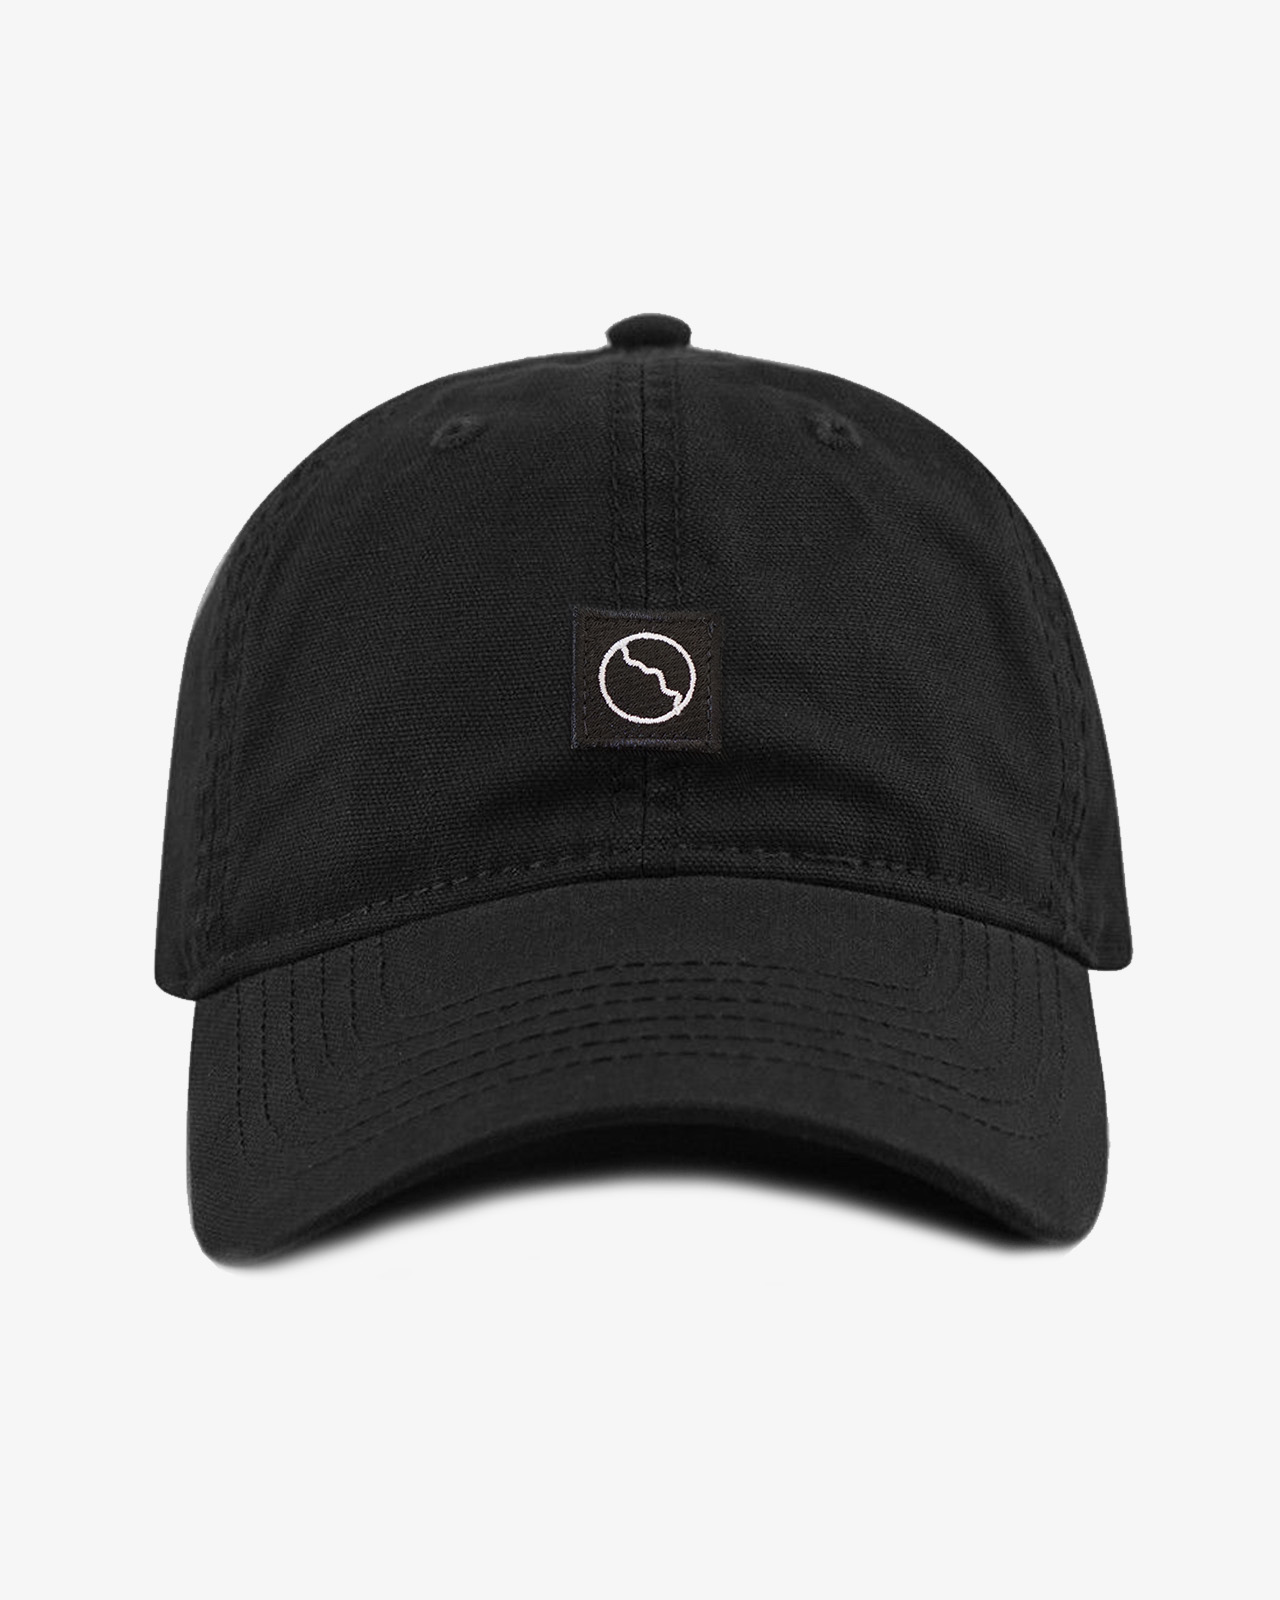 Black Patch Dad Cap